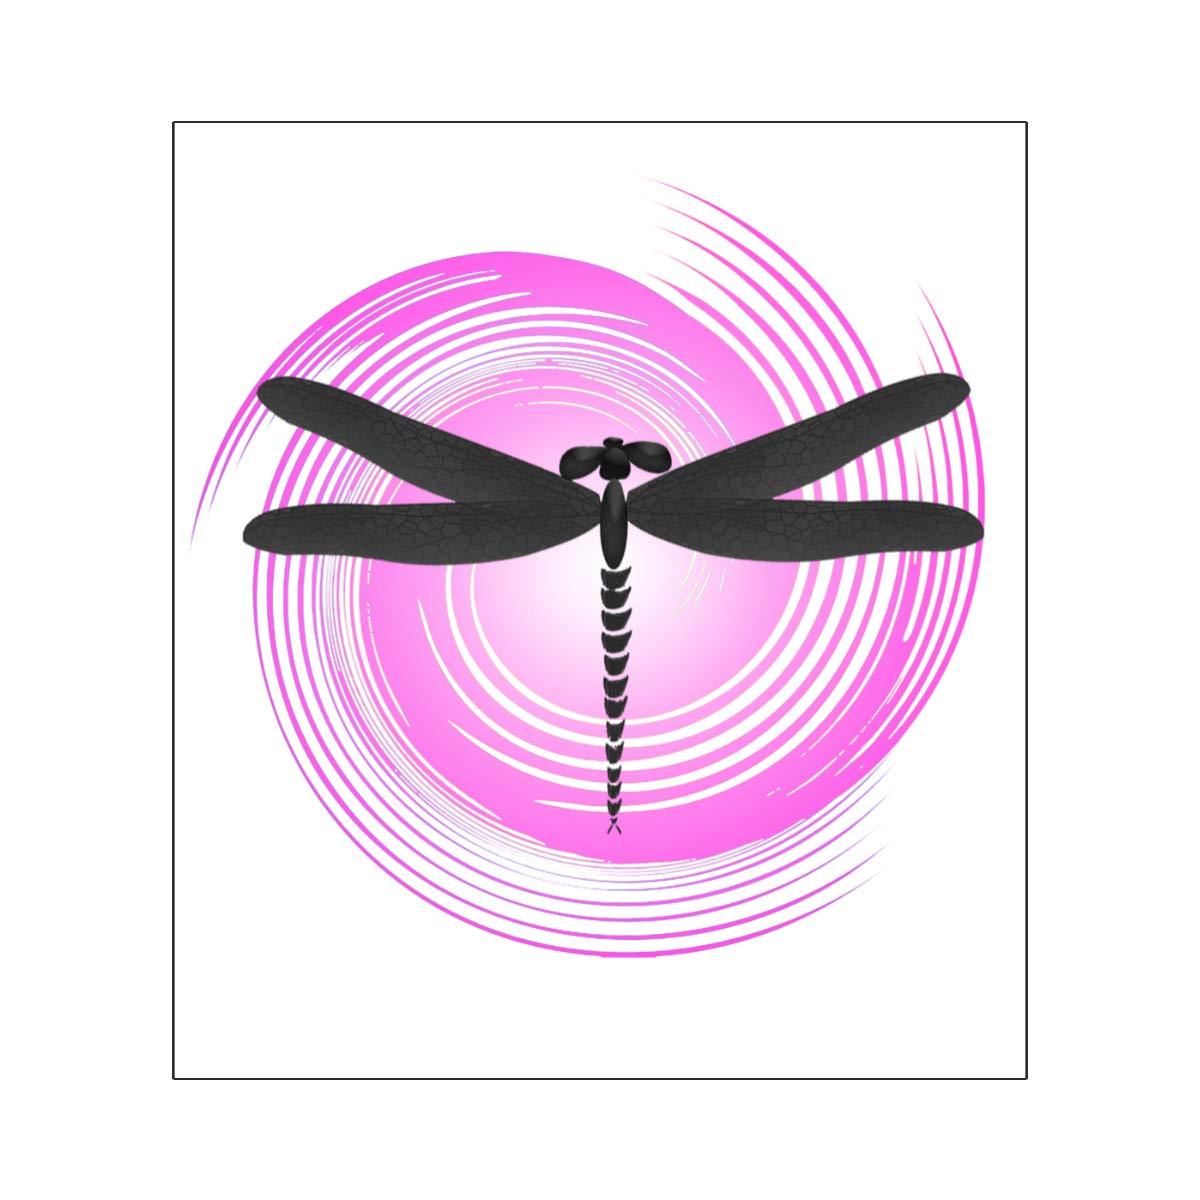 Harataki Retro Circle Dragonfly Unisex-Baby Newborn Short-Sleeve Bodysuit Rompers